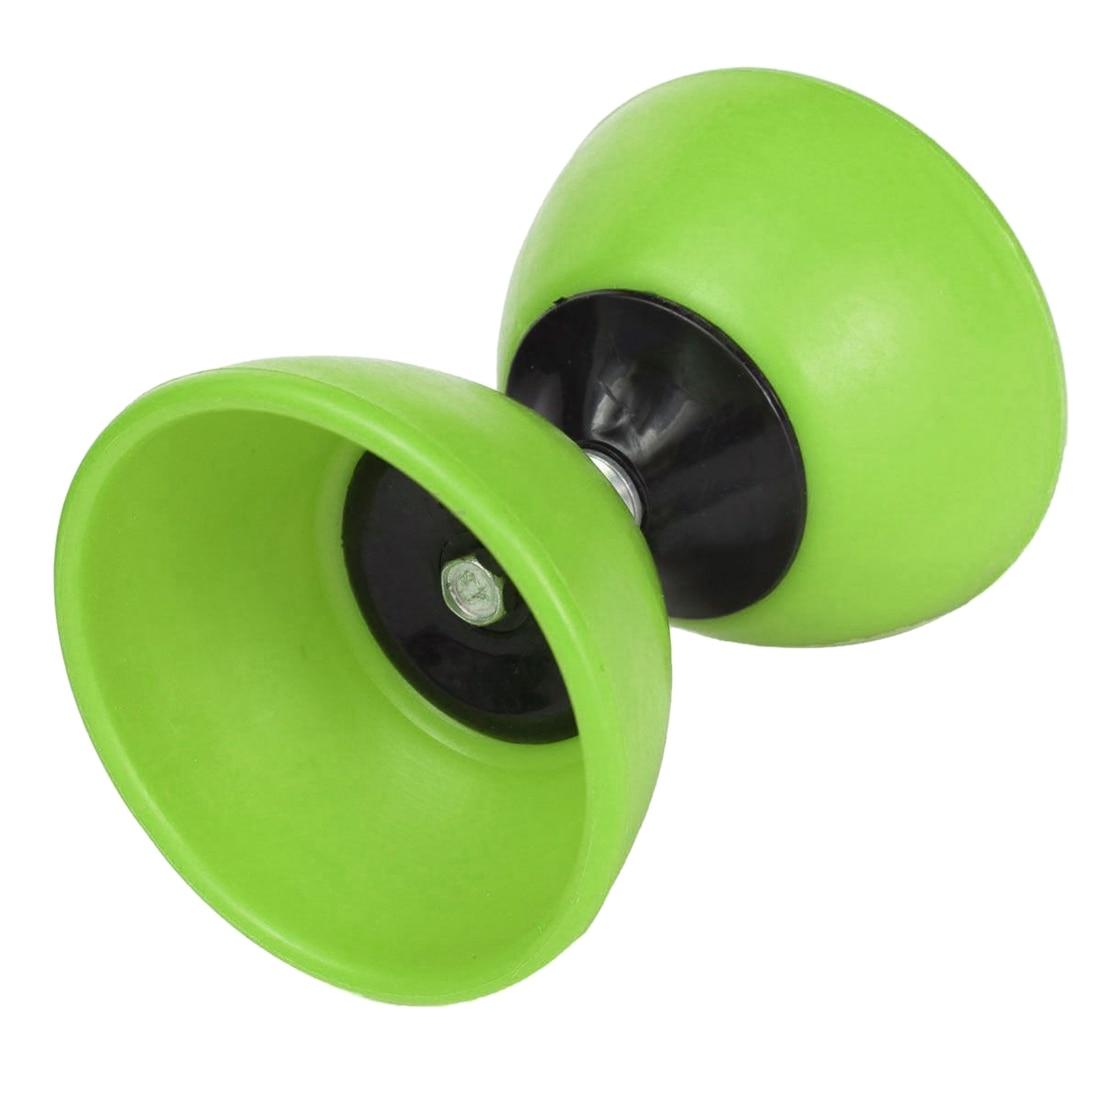 Big Bowl Diabolo + Plastic Sticks - Chinese YoYo Juggling Toy Gift du weike с популярными брендами стопорное возглавил диаболо diabolo новичку диаболо монополия диаболо diabolo тренажерами ом